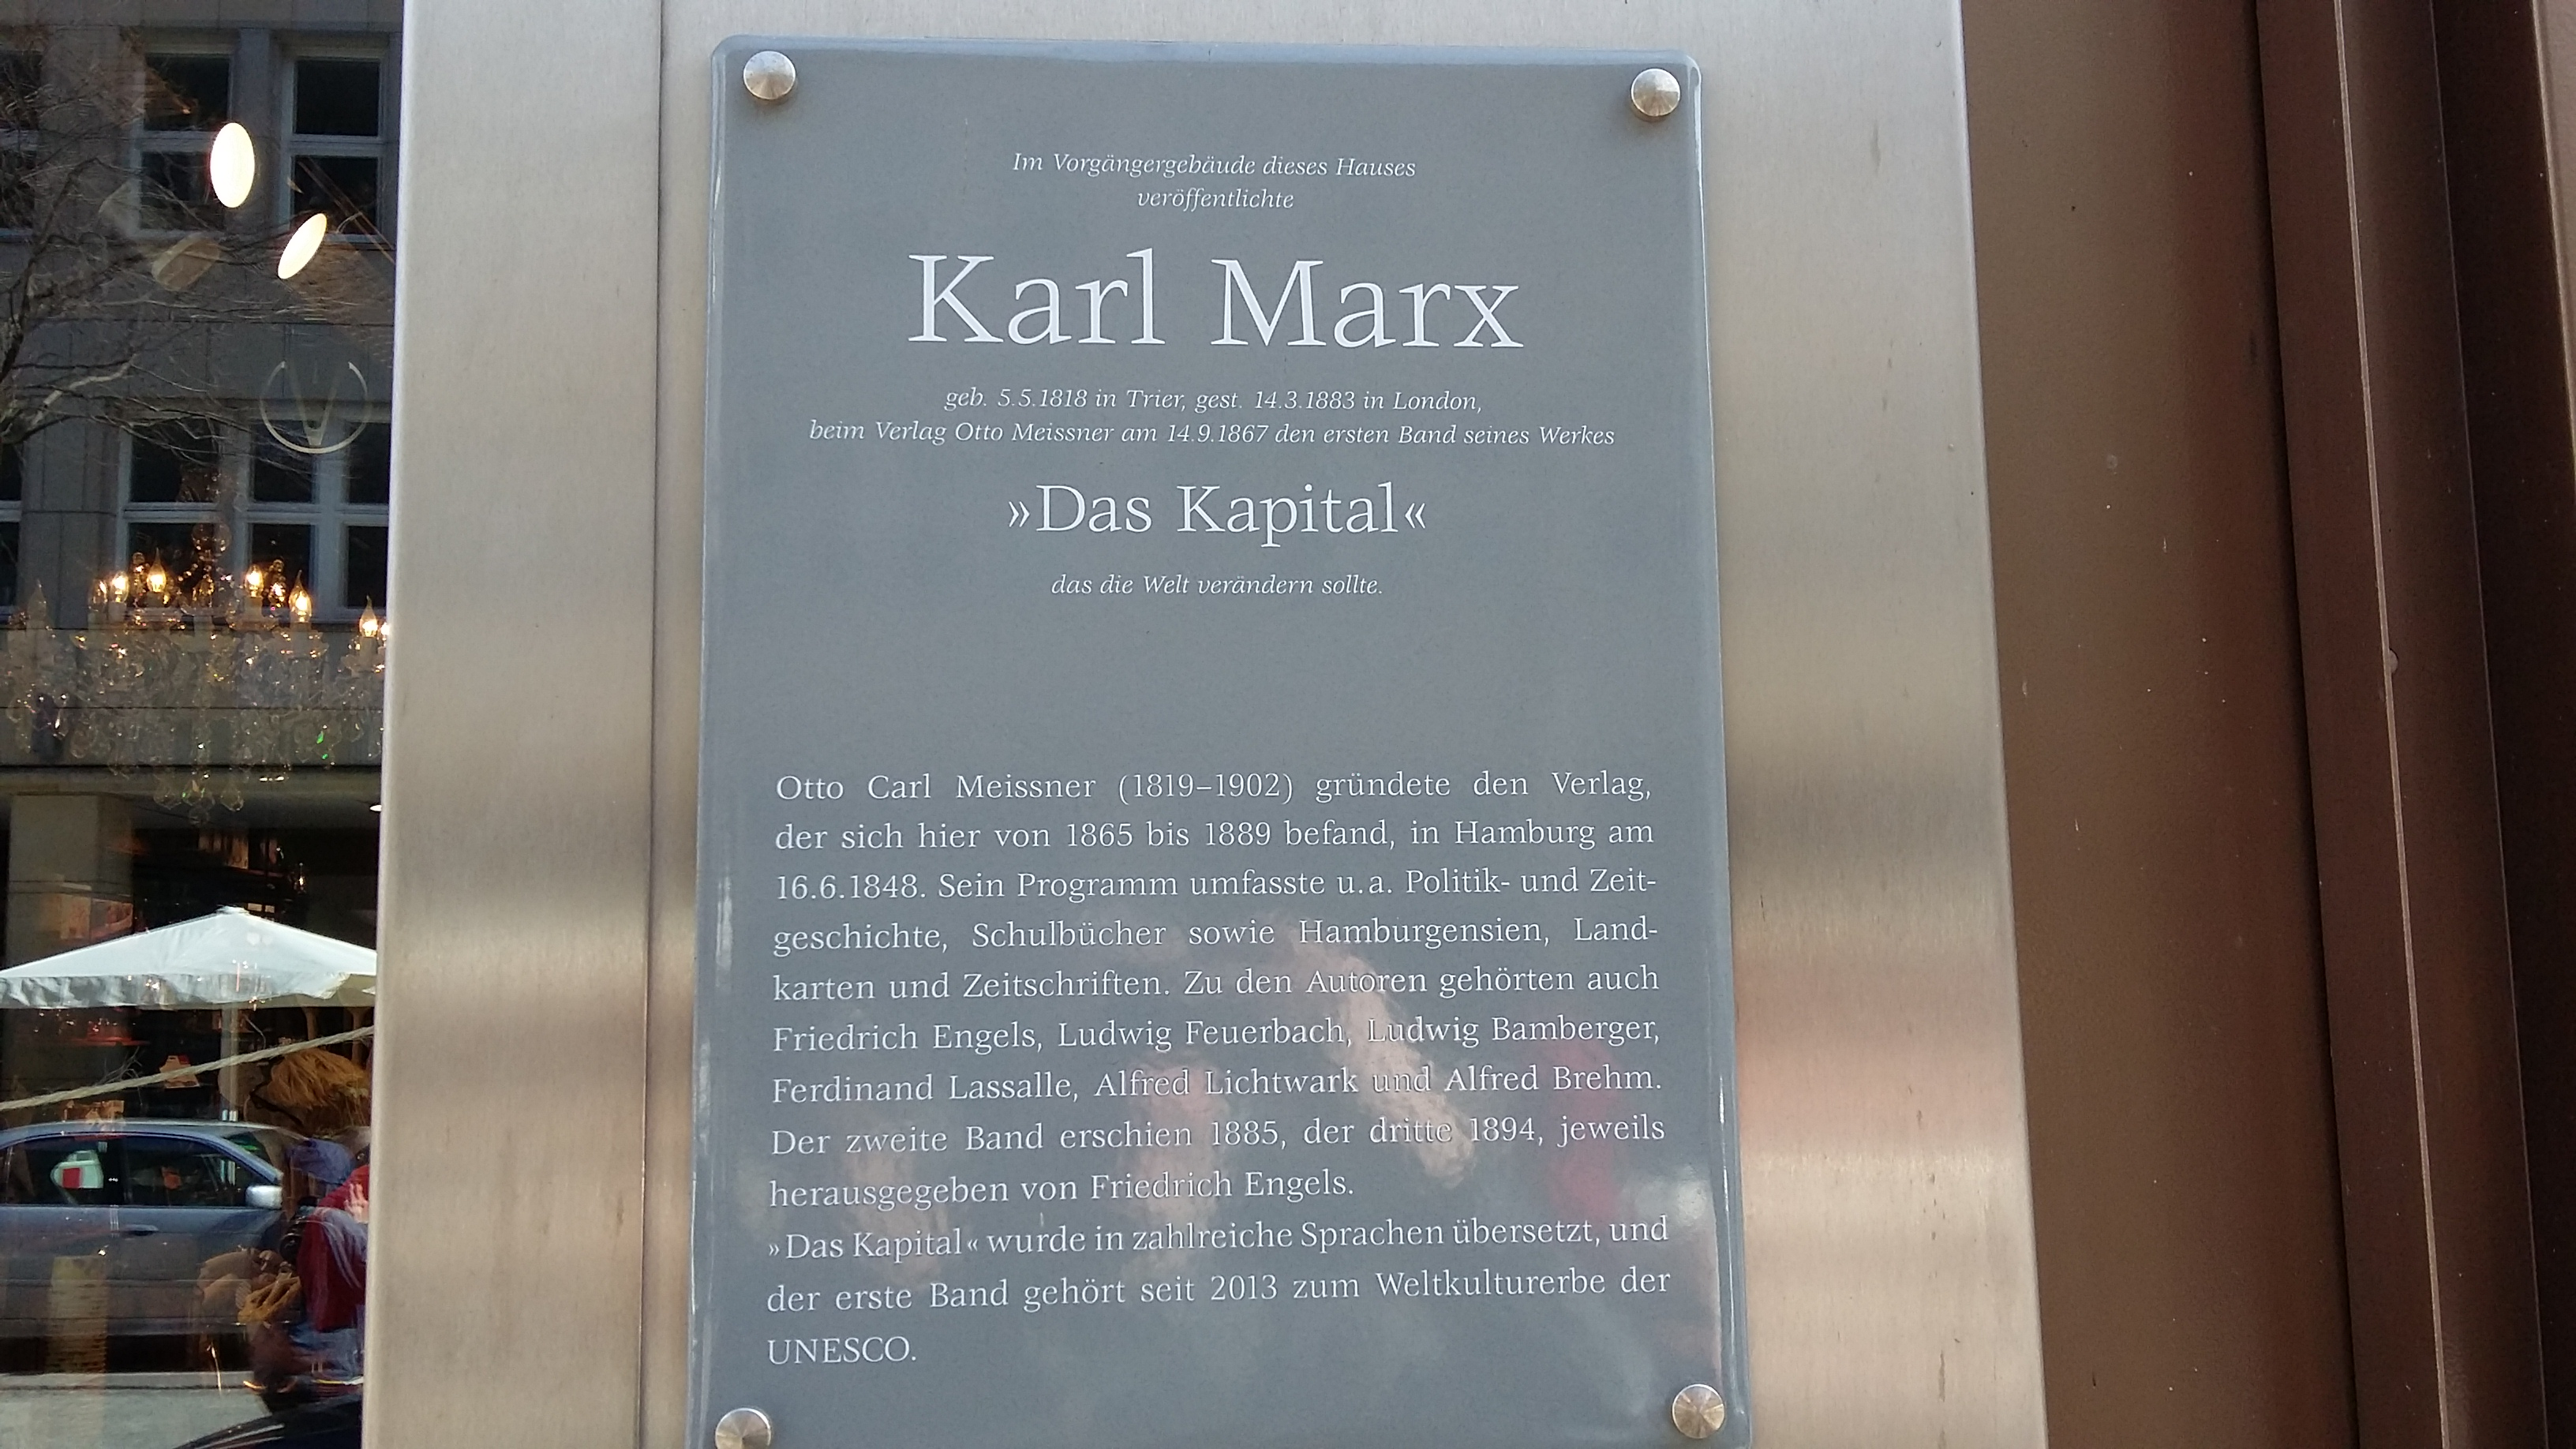 A hypothetical conversation between karl marx